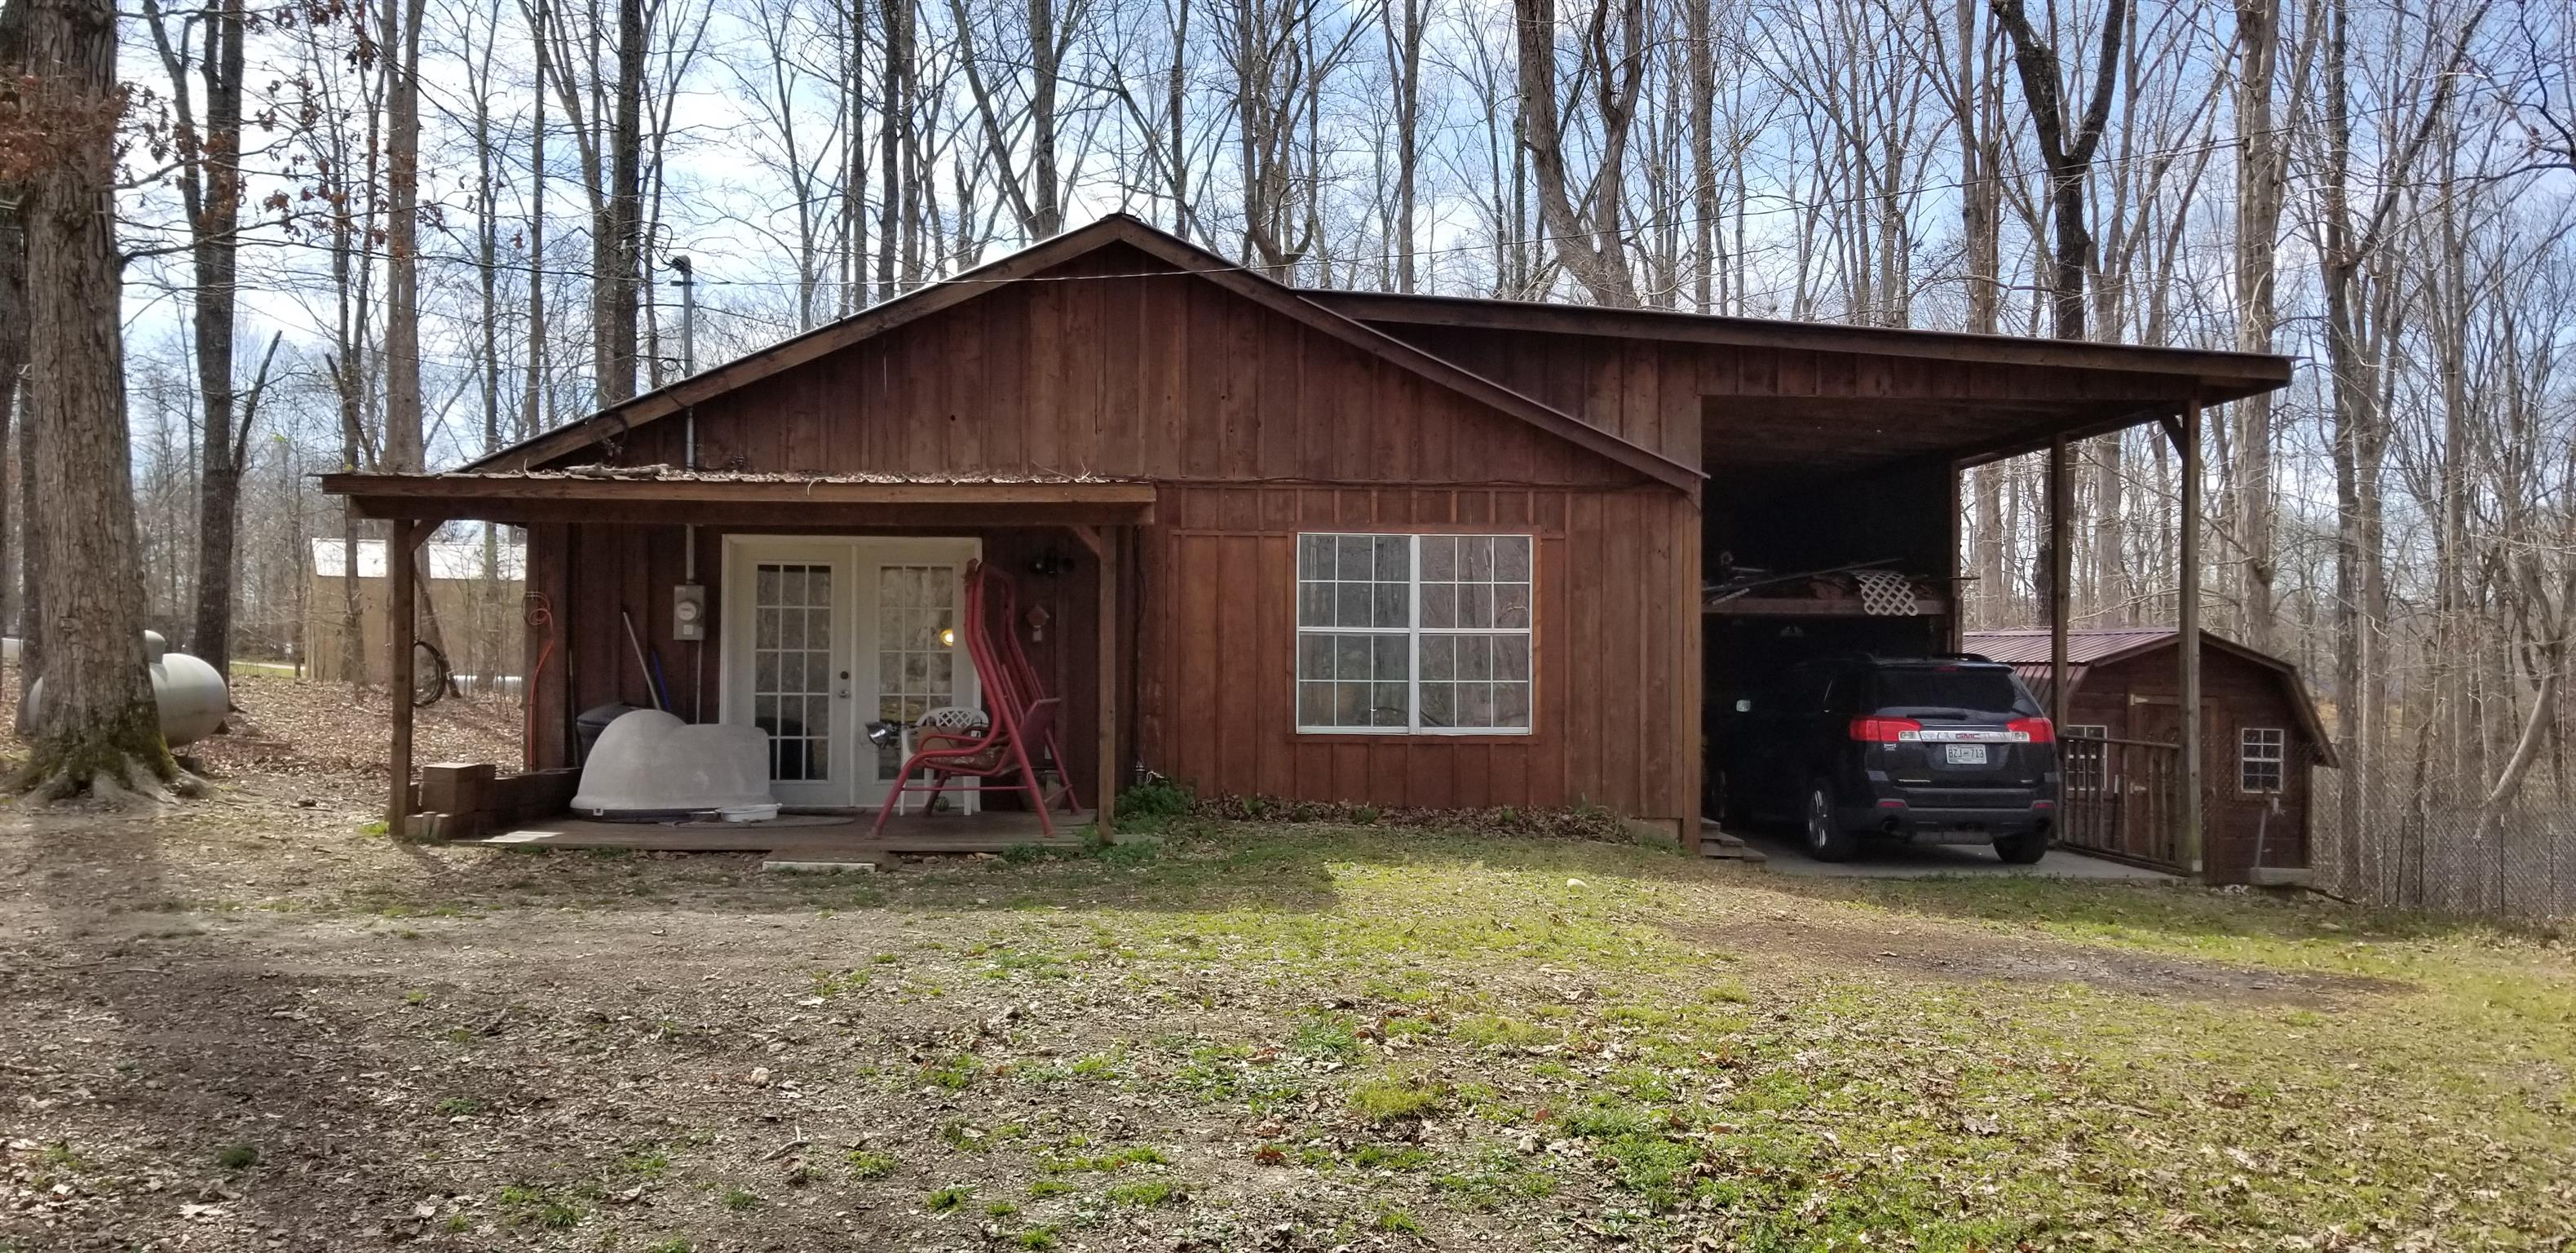 755 Driftwood Dr, Lobelville, TN 37097 - Lobelville, TN real estate listing